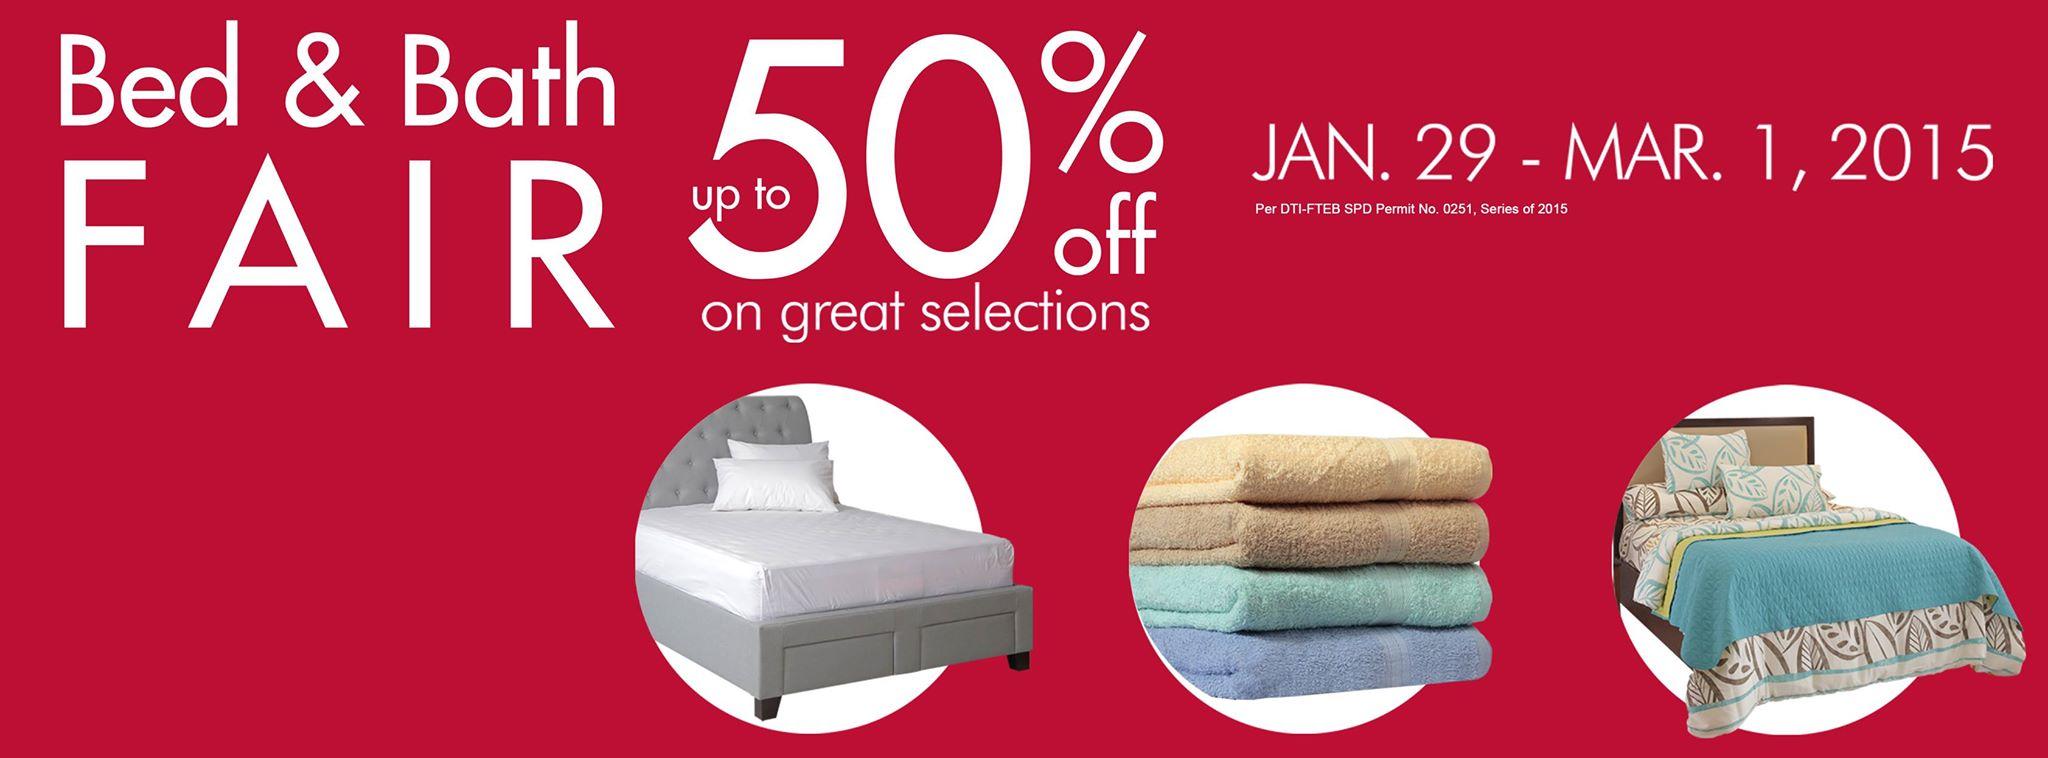 SM Home Bed & Bath Fair January - March 2015